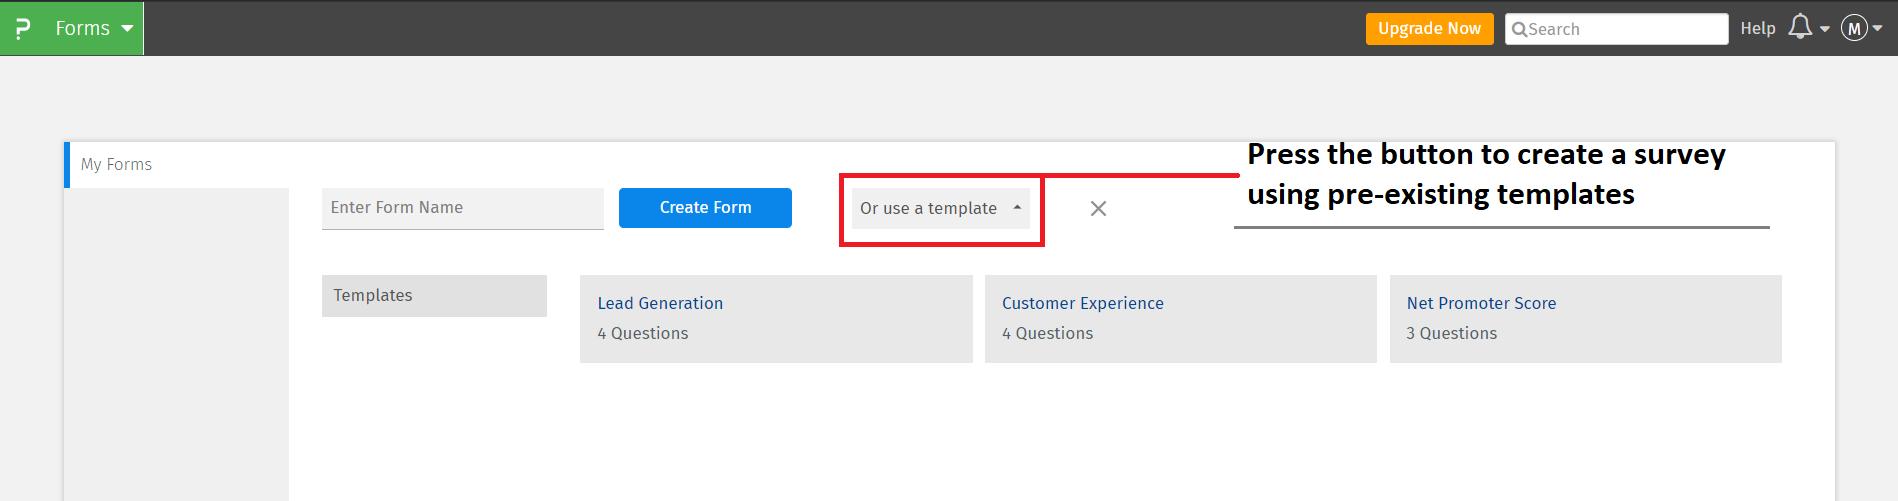 create-a-survey-using-a-template